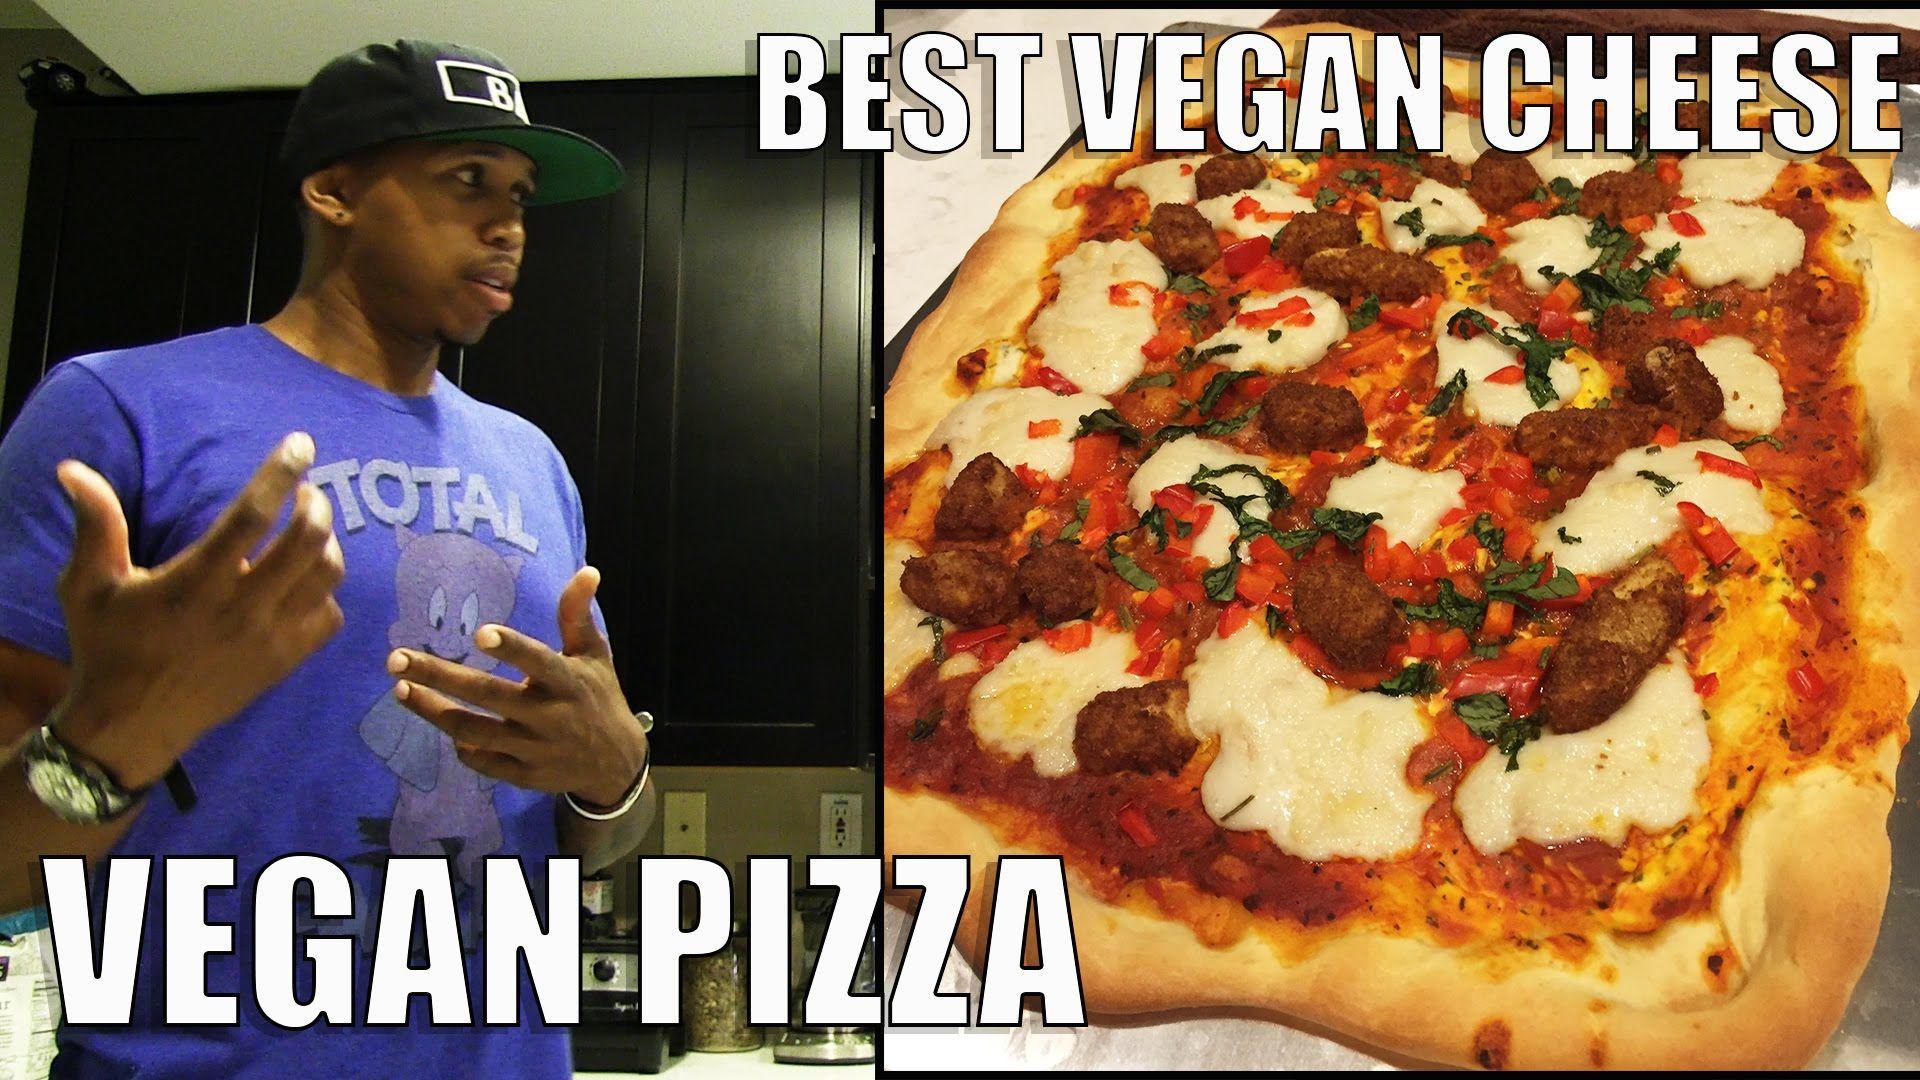 Vegan PIZZA with BADASSVEGAN